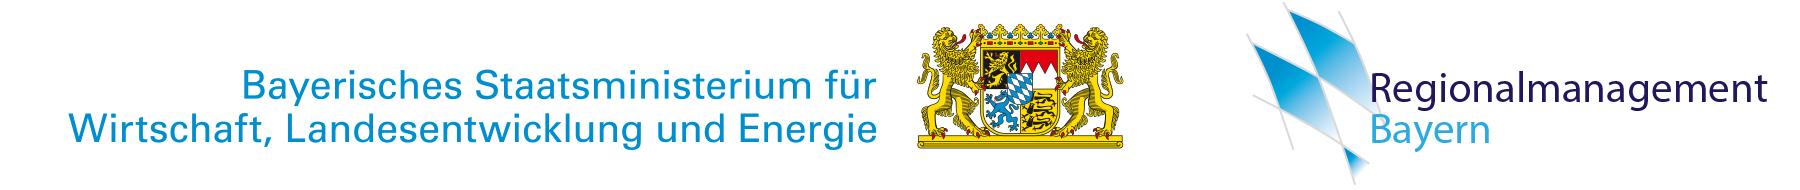 Logo Regionalmanagement Bayern